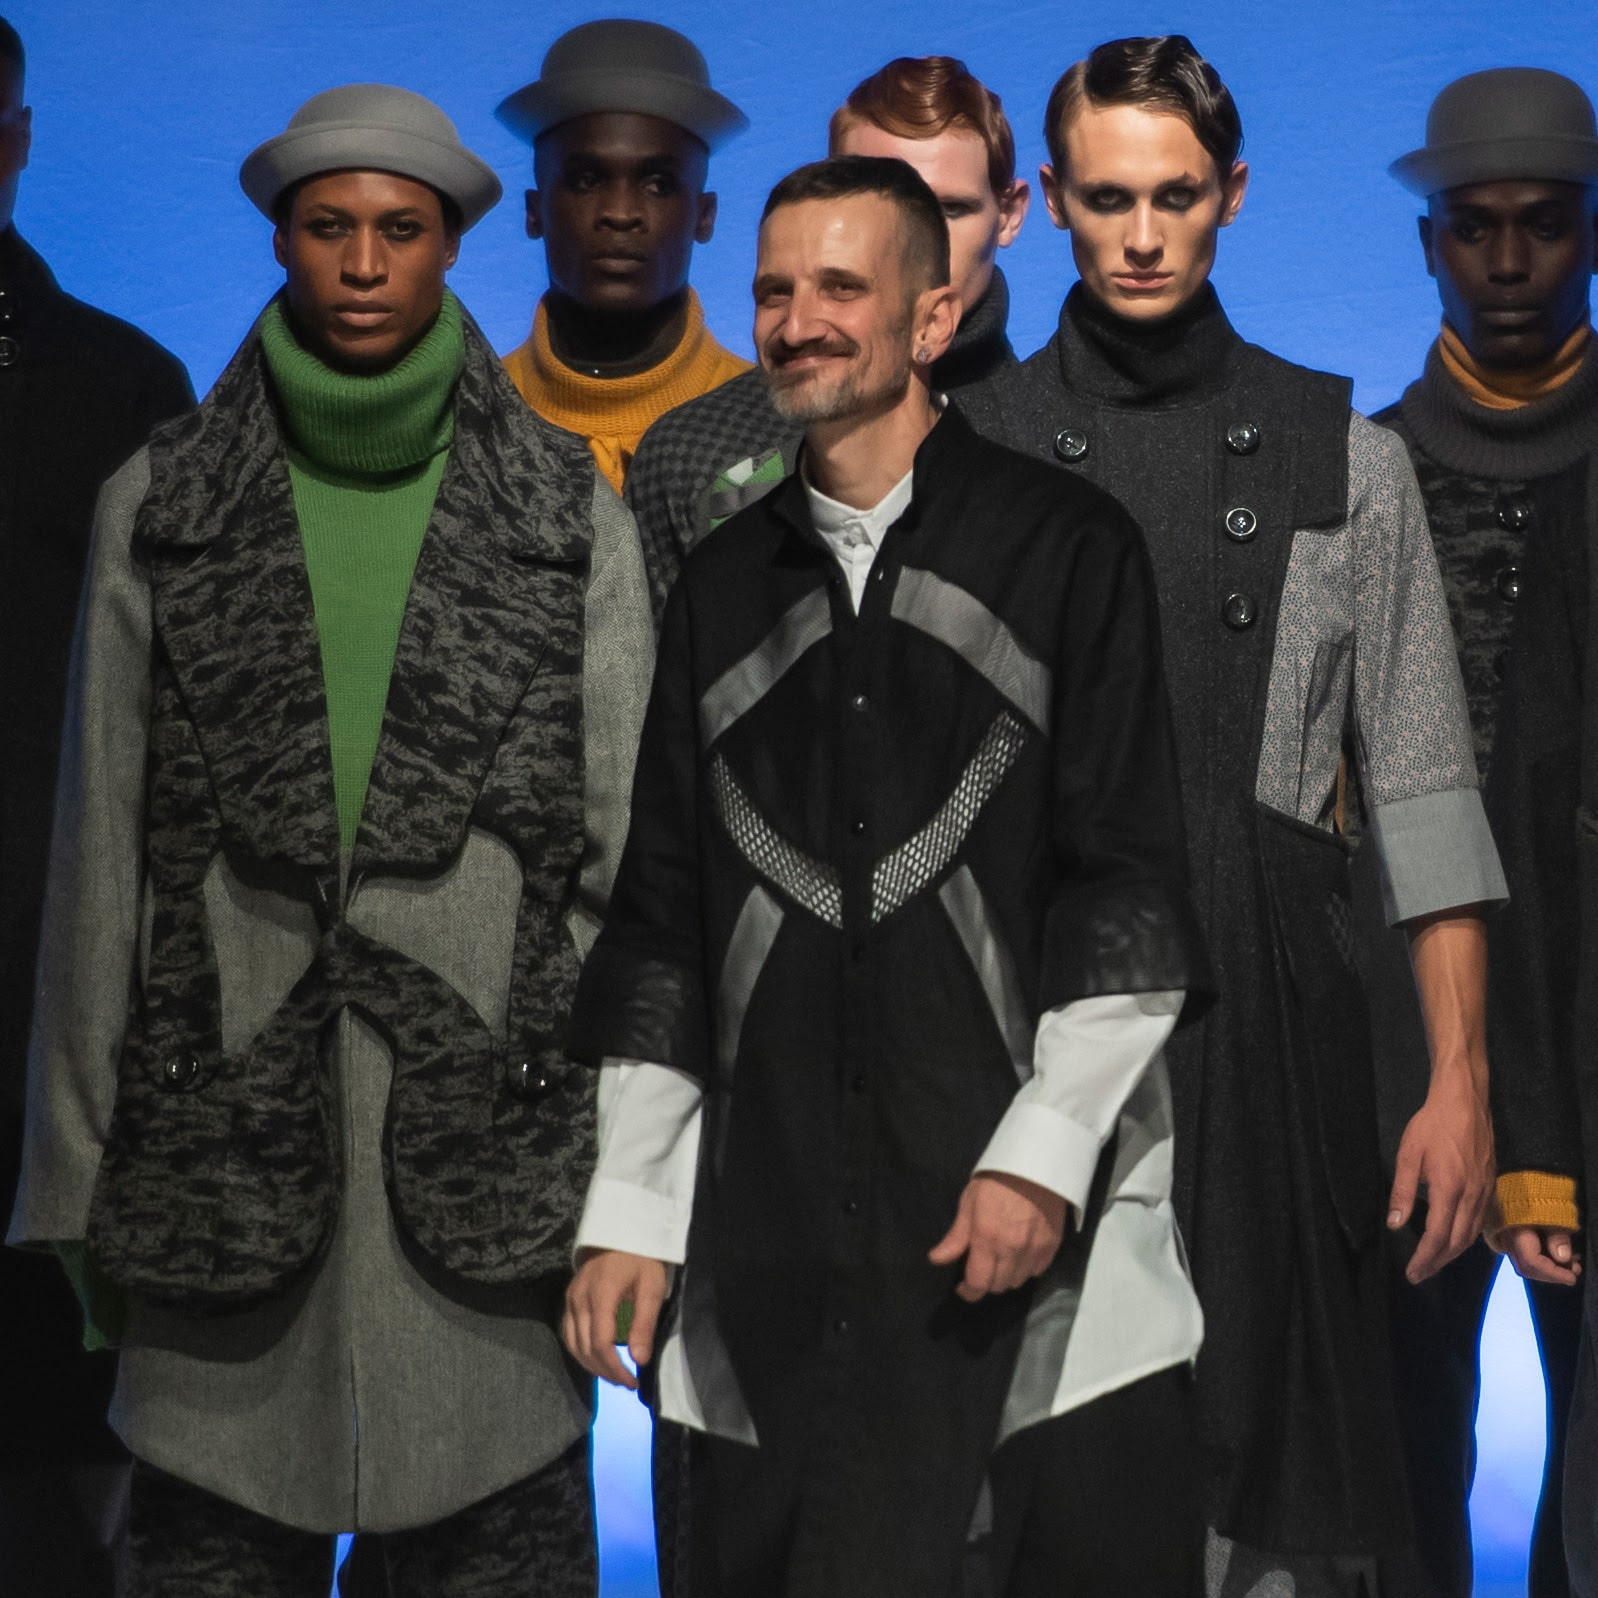 South Africa Fashion Designer Archives Nairobi Fashion Hub African Fashion Blog